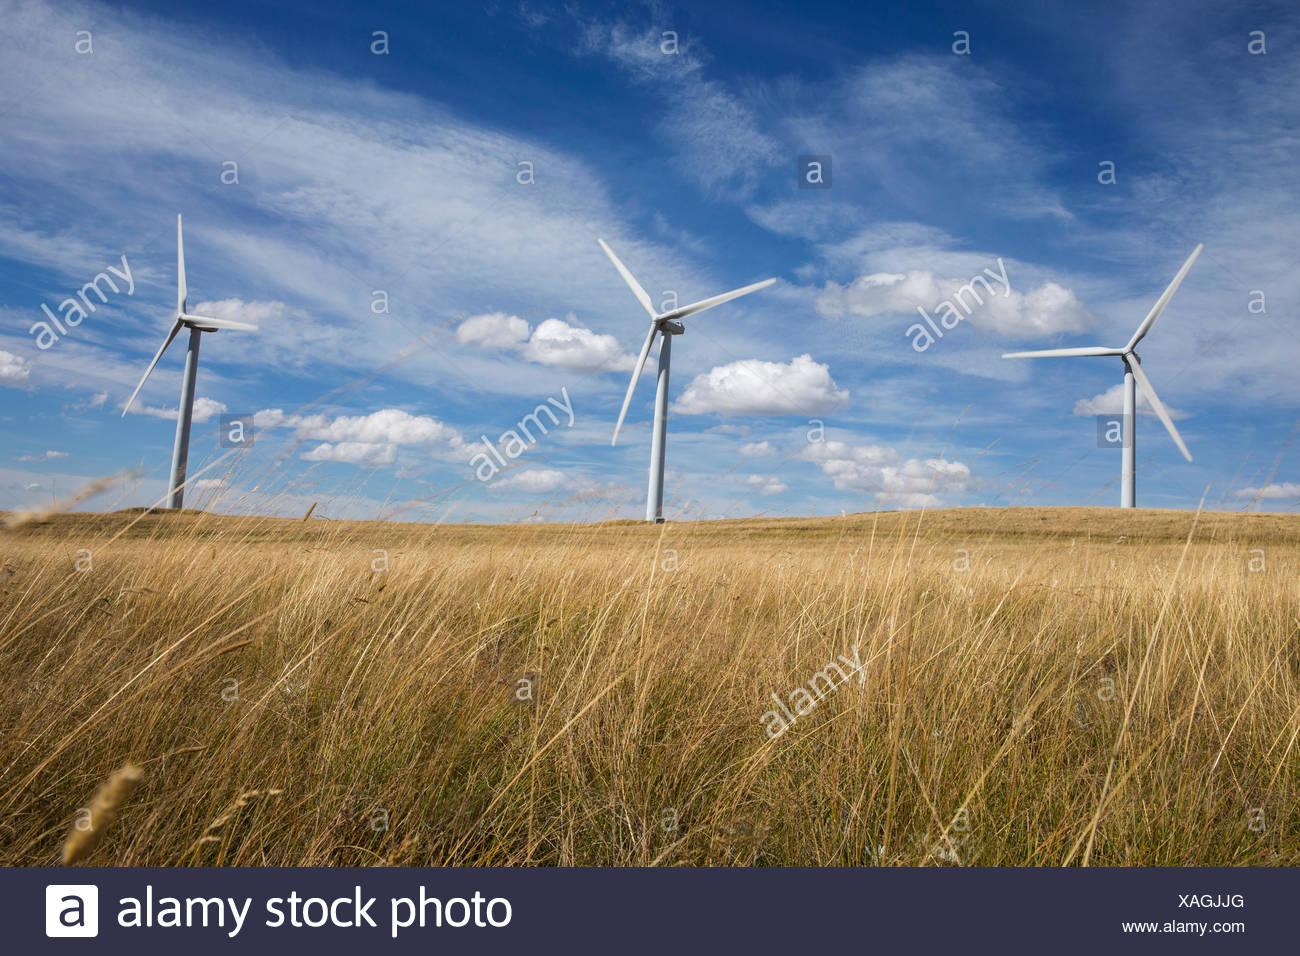 Alternative choice stock photos alternative choice stock for Wind mobile family plan